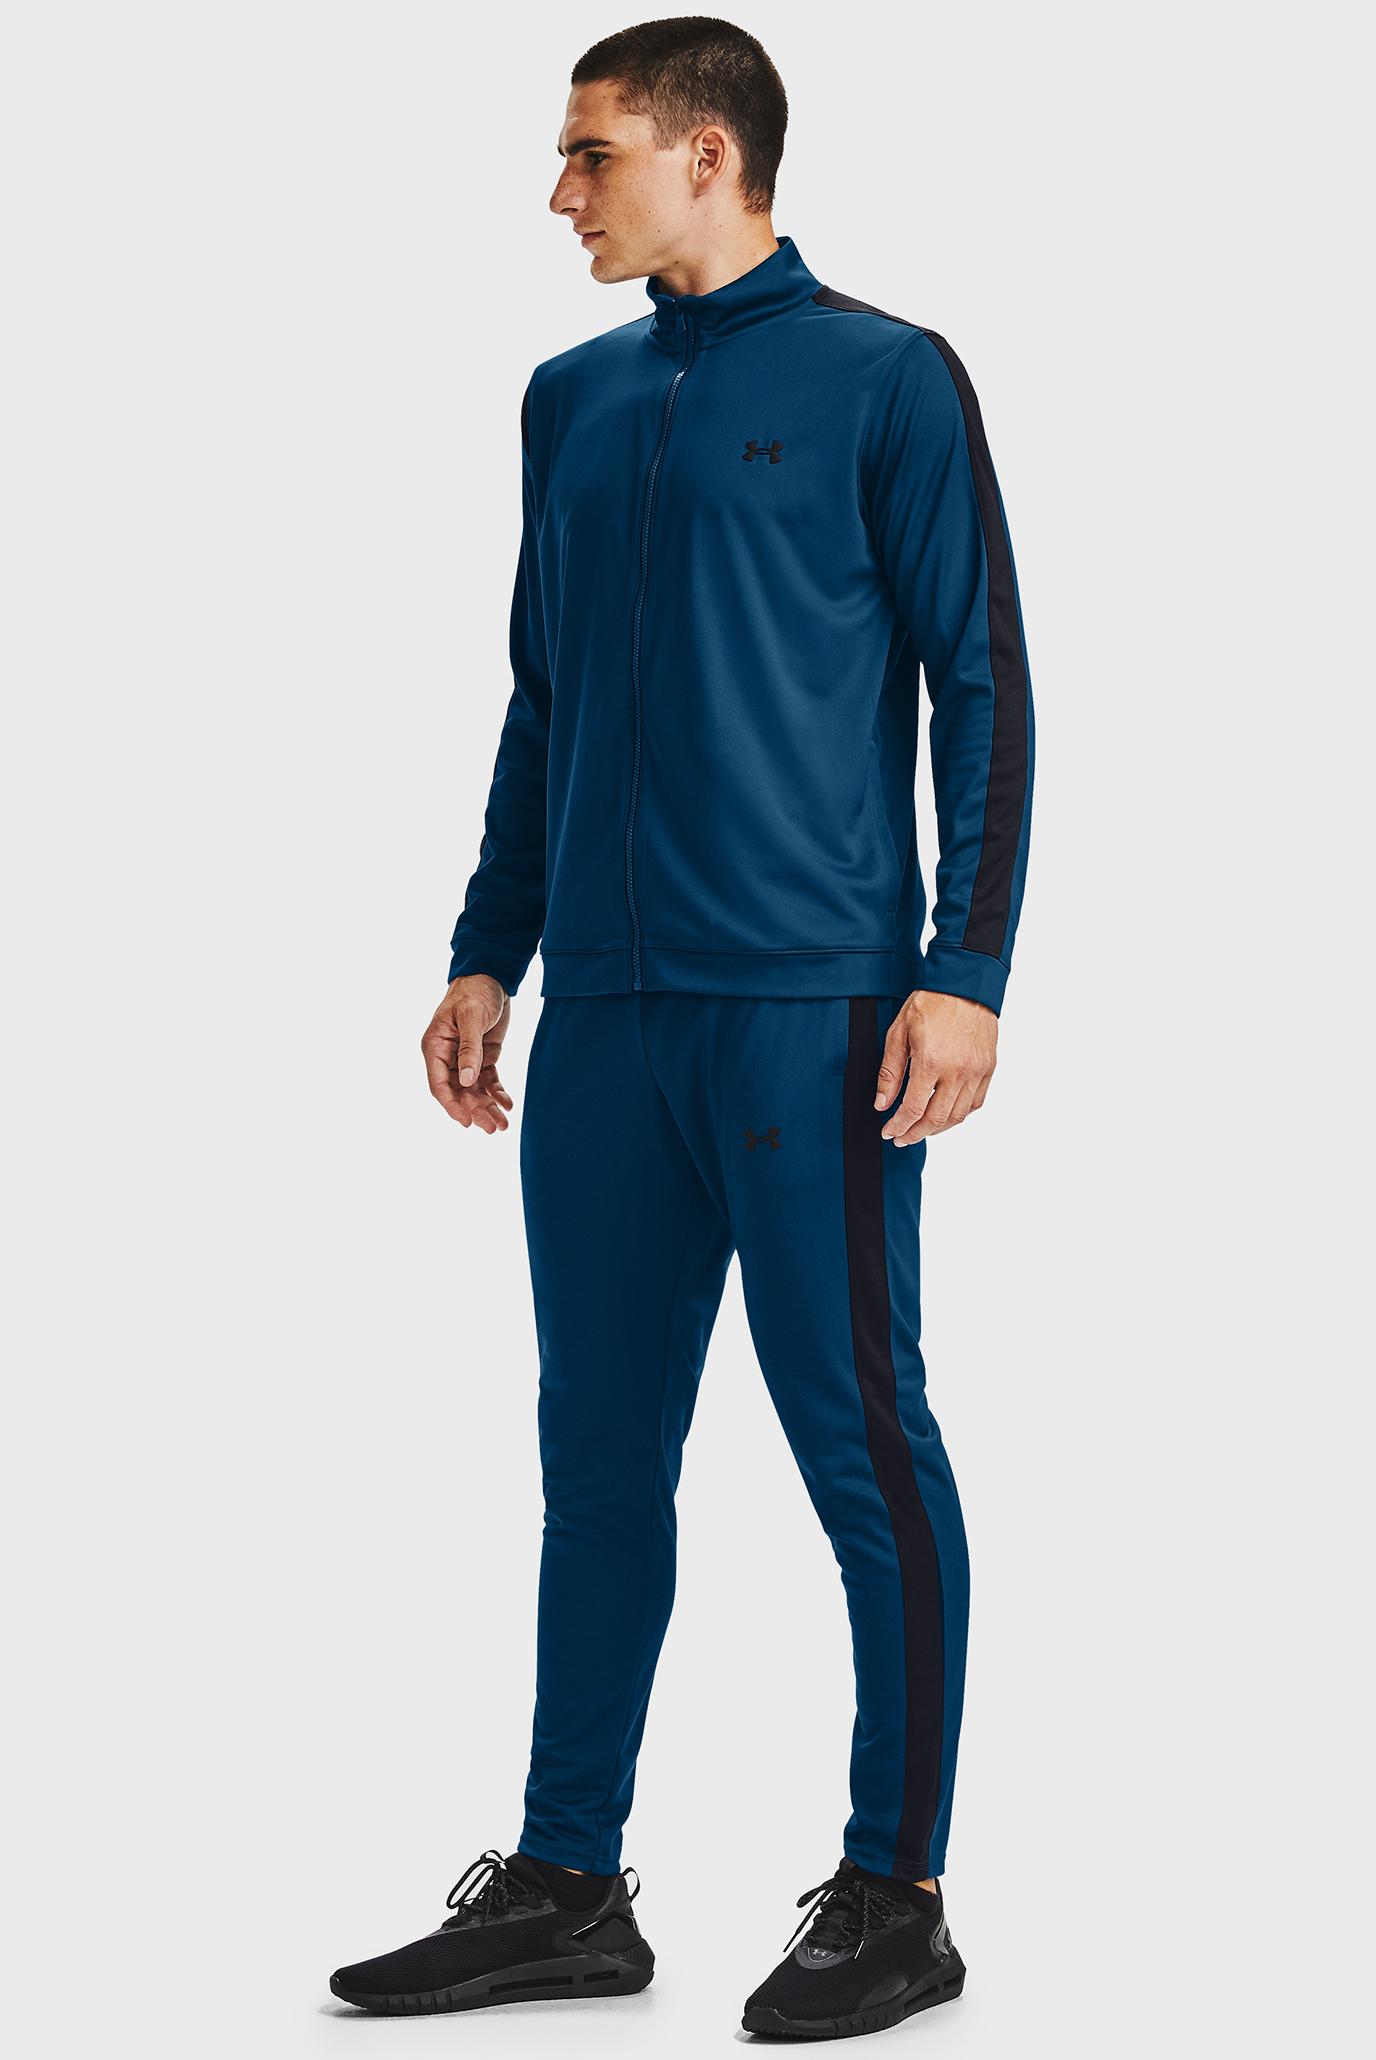 Мужской синий спортивный костюм (кофта, брюки) UA EMEA Track Under Armour